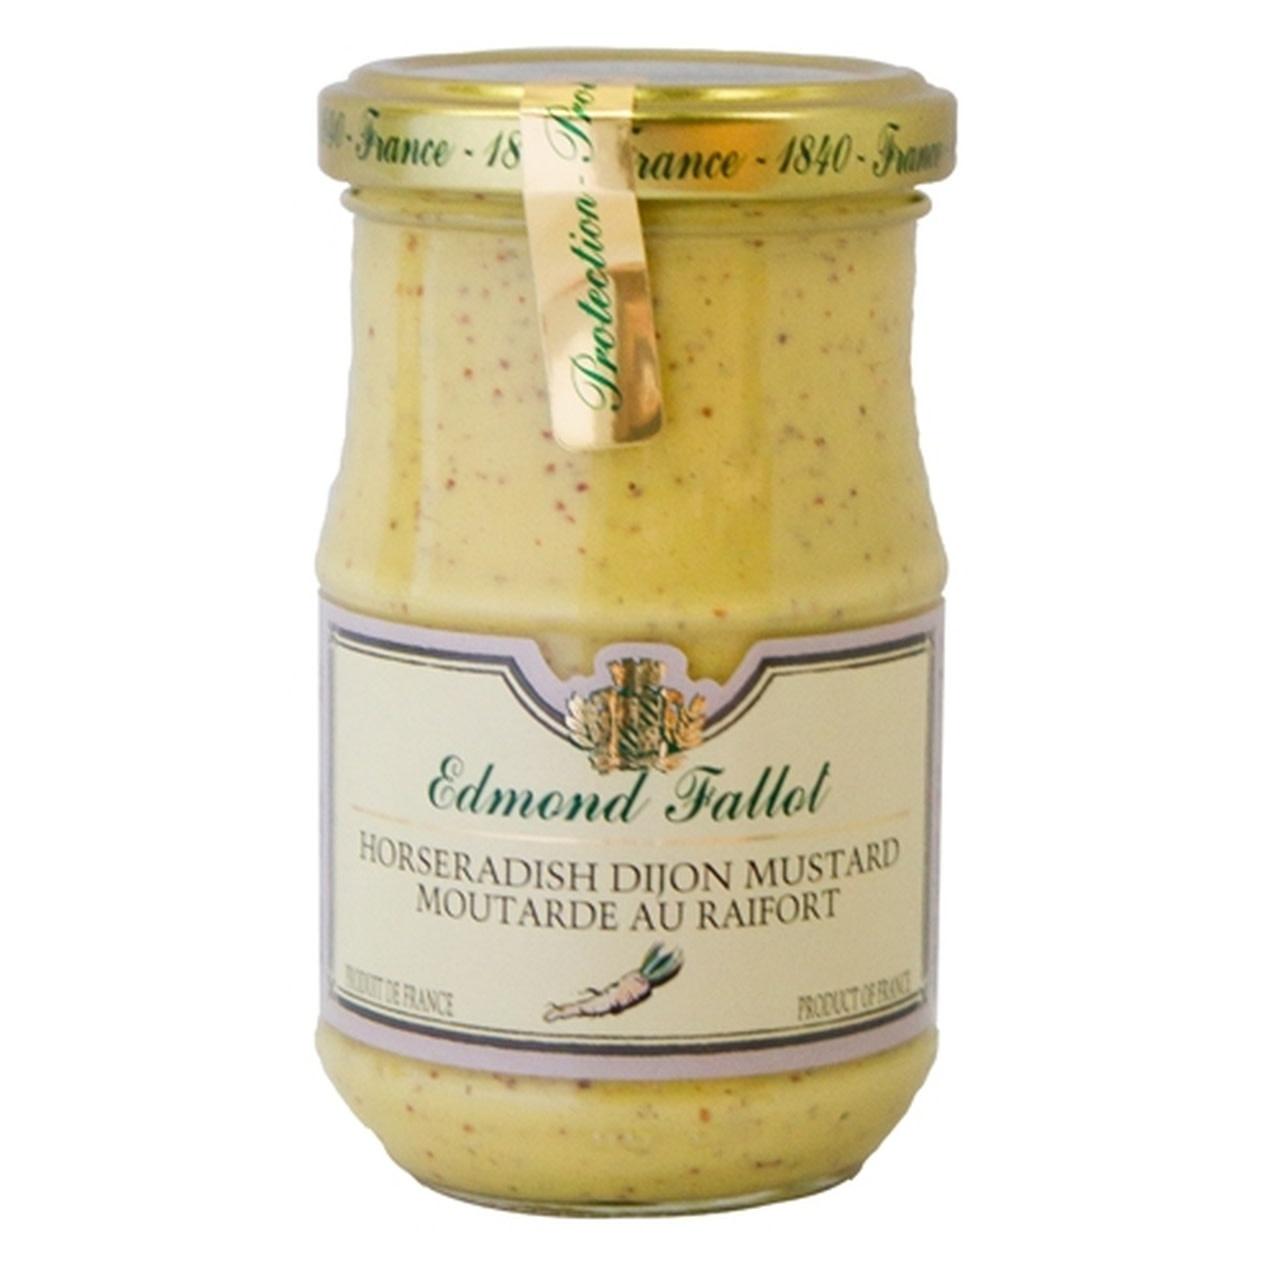 Edmond Fallot Horseradish Dijon Mustard, Moutard au Raifort 7.4 oz.